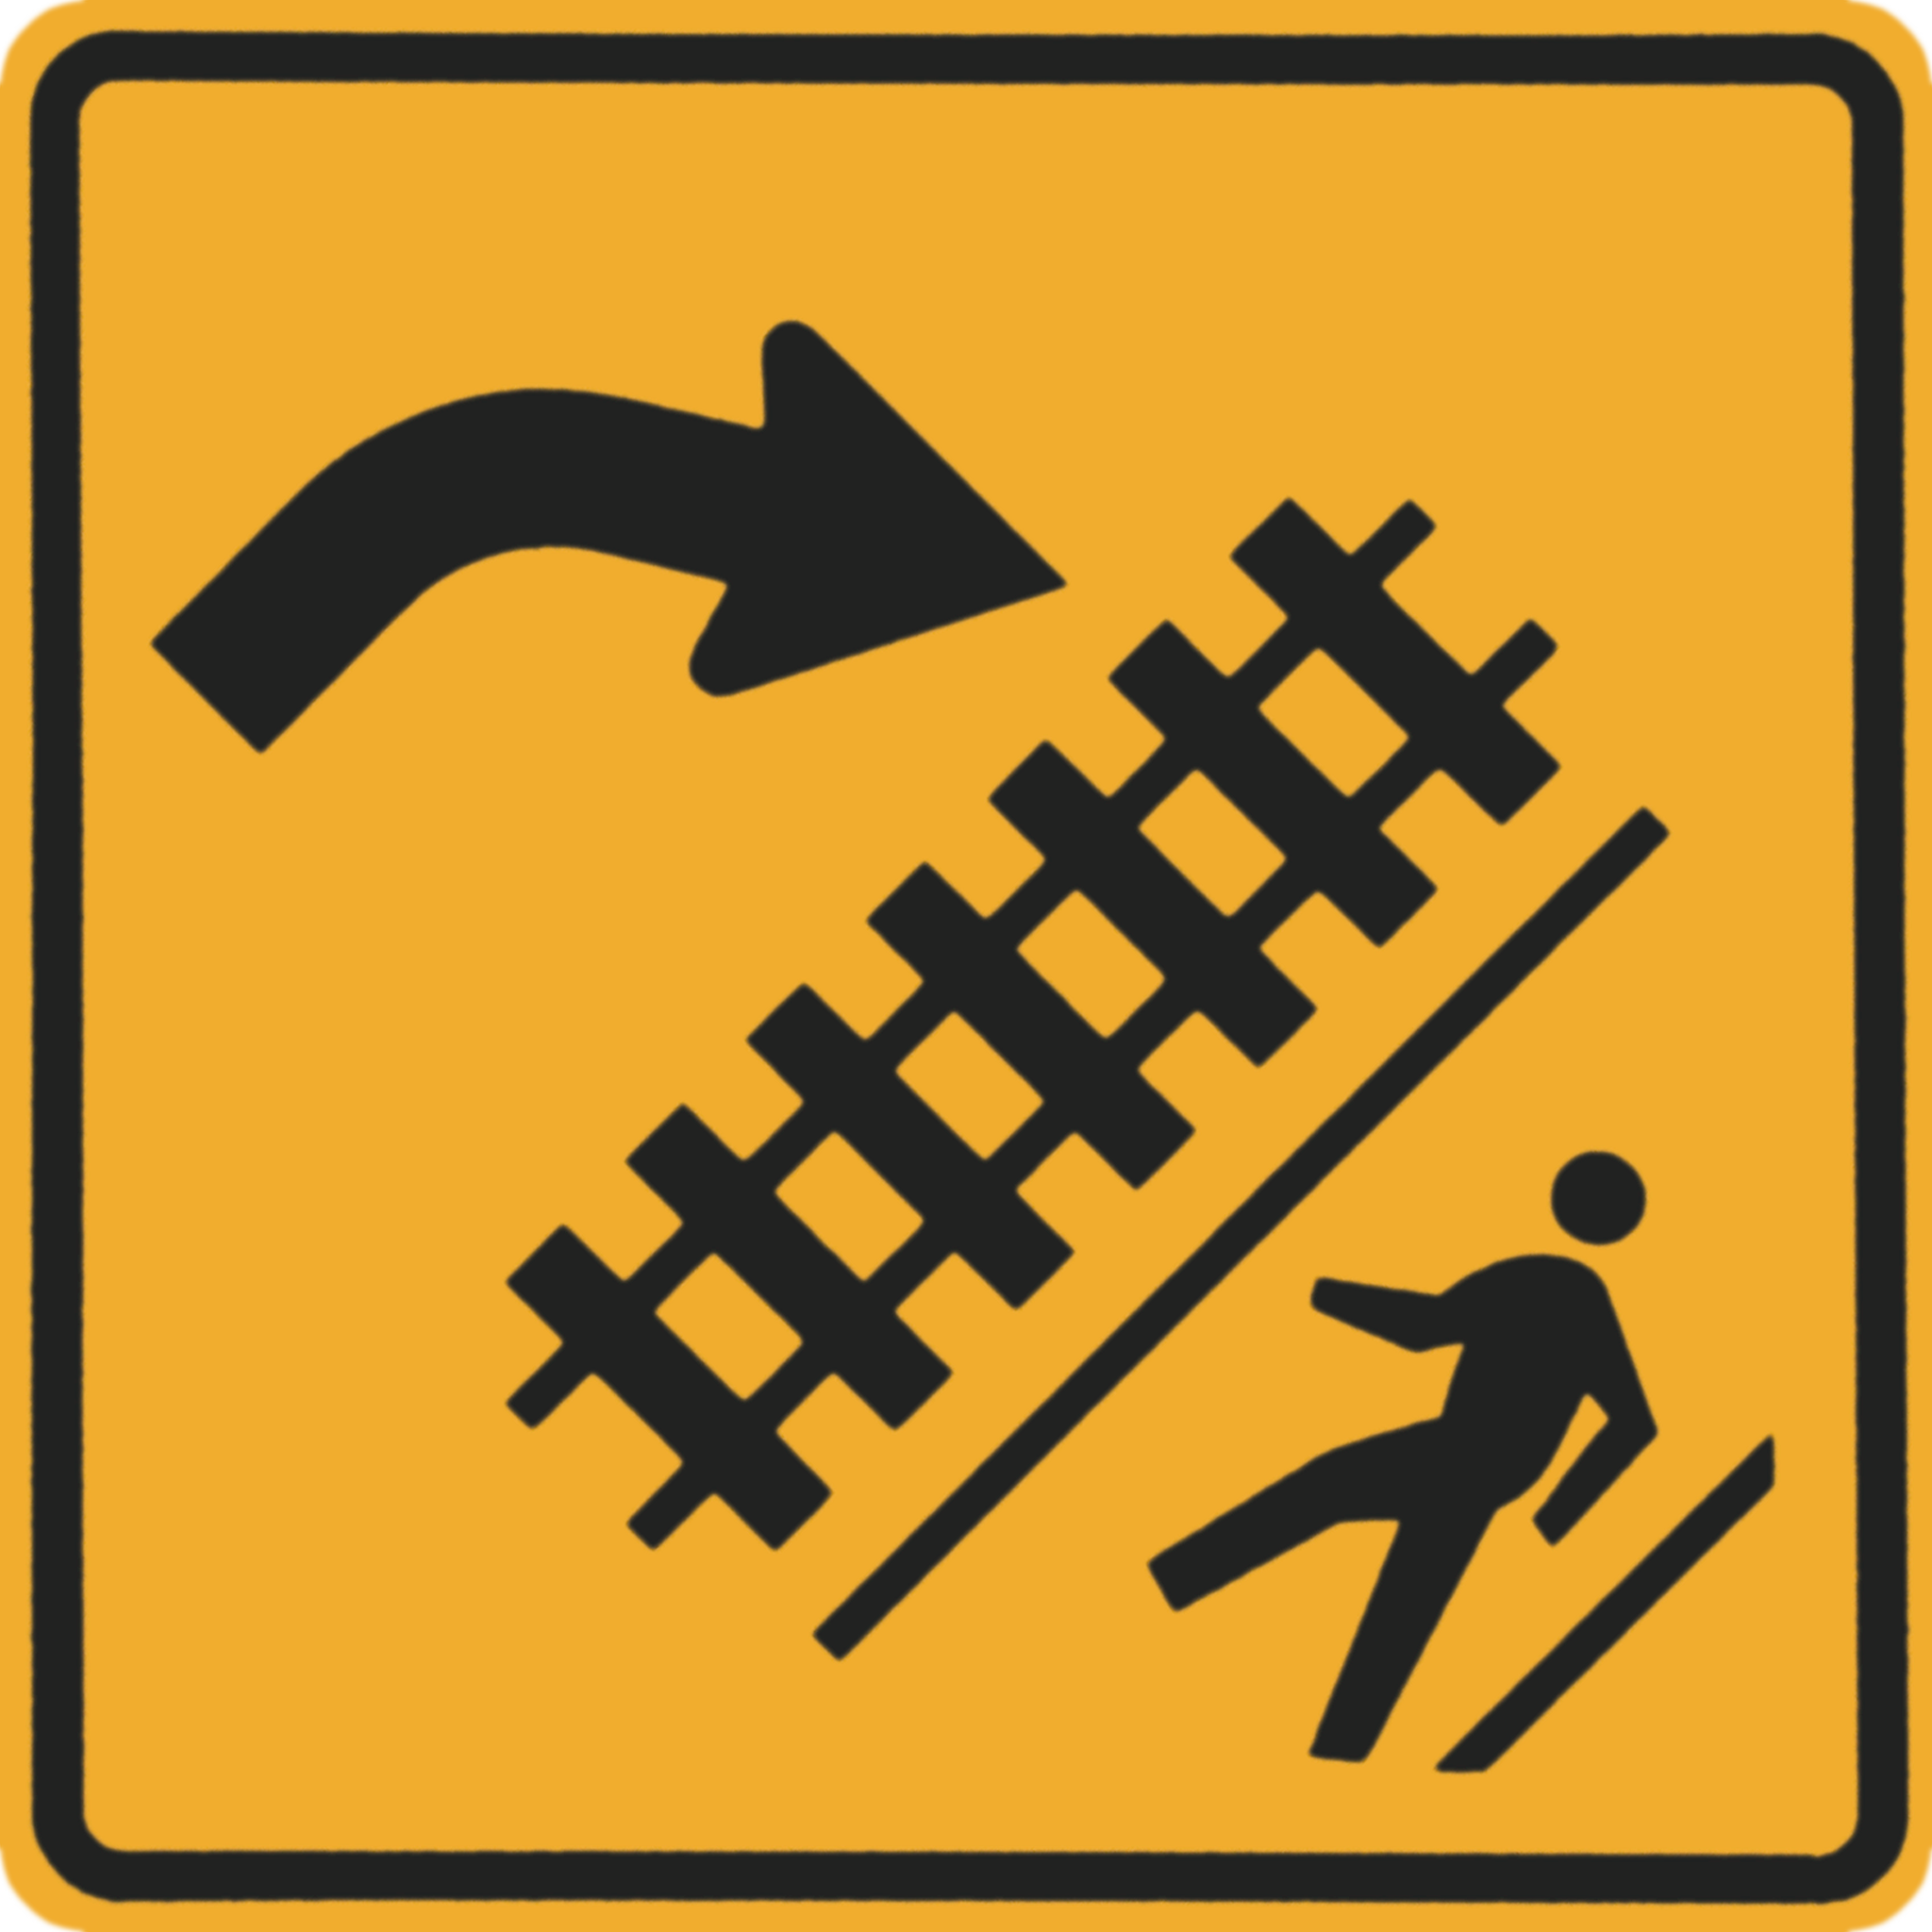 Pedestrian Railroad Crossing.png